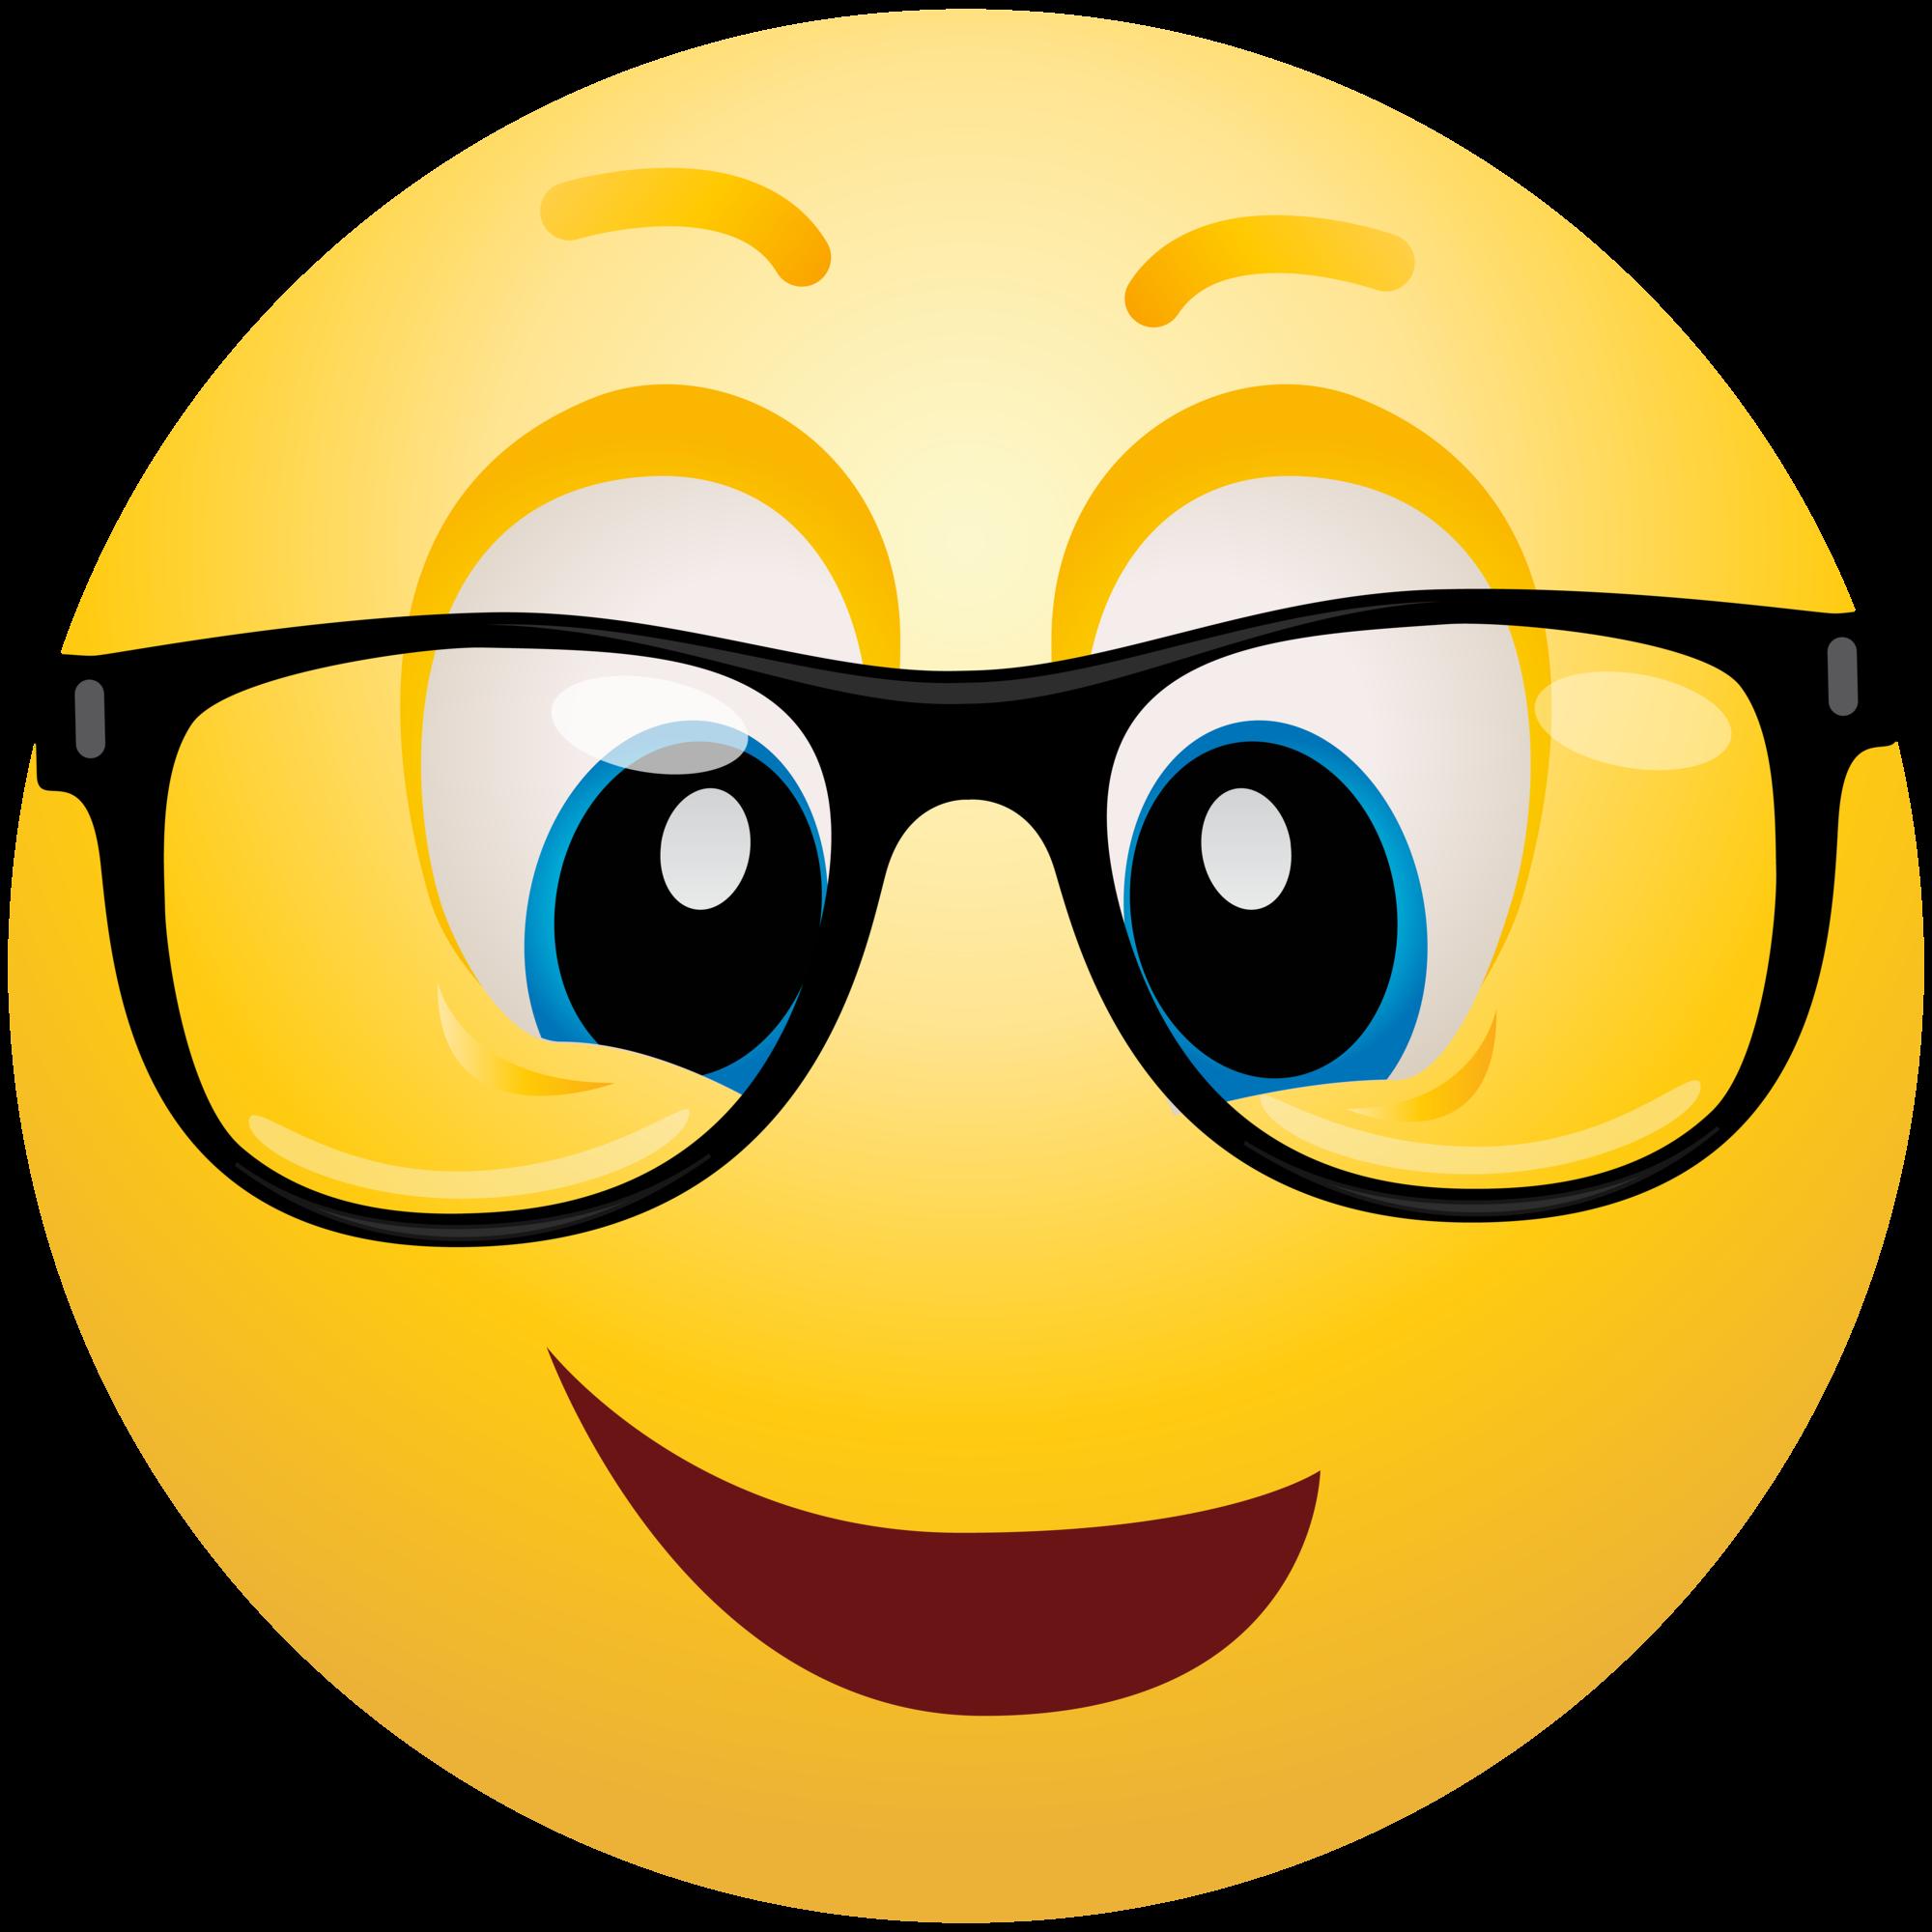 Geek emoji info . Sunglasses clipart emoticon